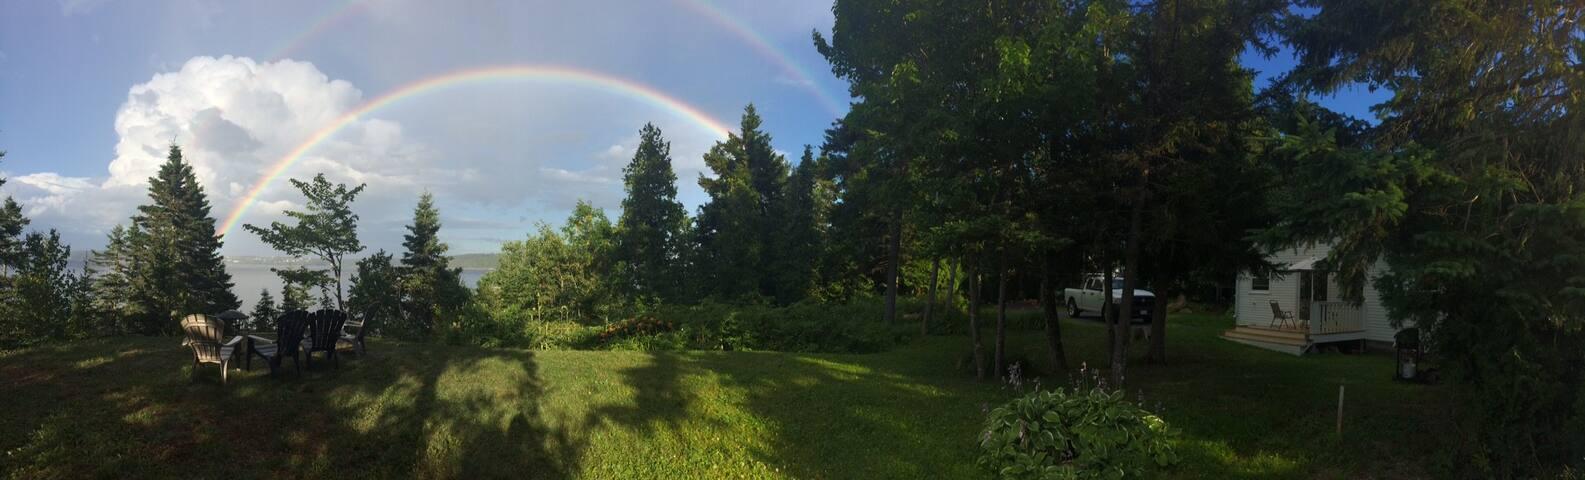 Rainbow over Windwood Point